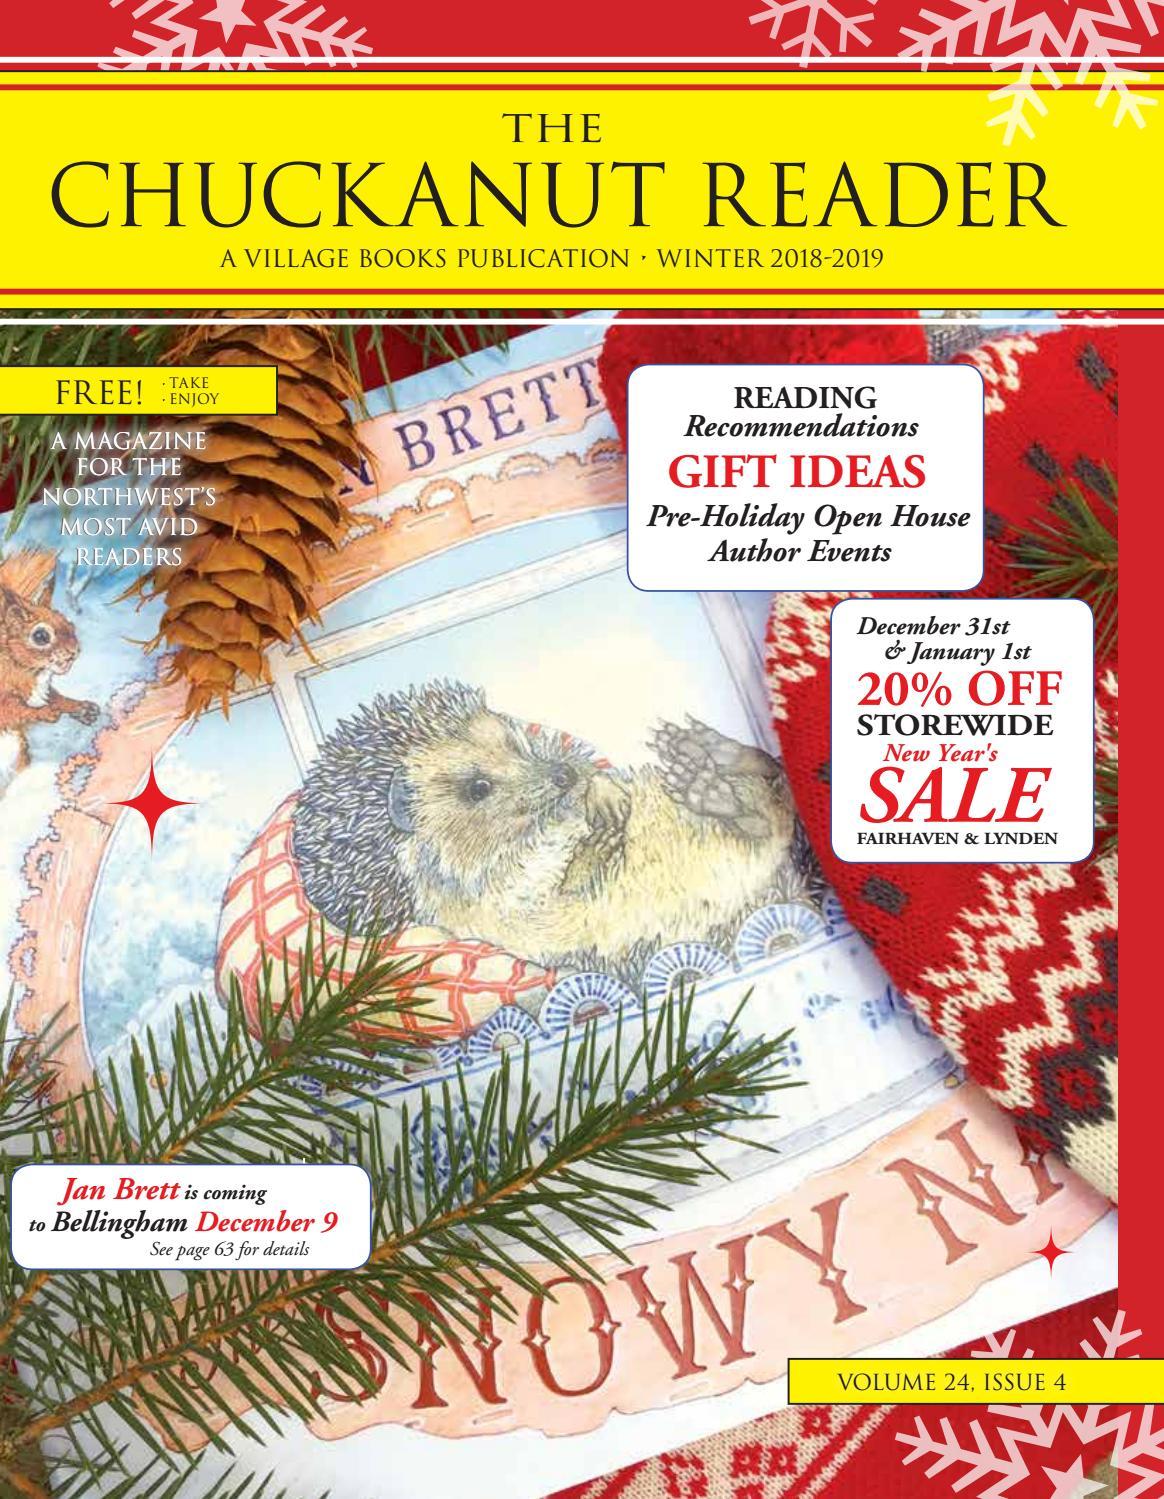 b1ed4556 The Chuckanut Reader - Winter 2018/2019 by Village Books & Paper Dreams -  issuu